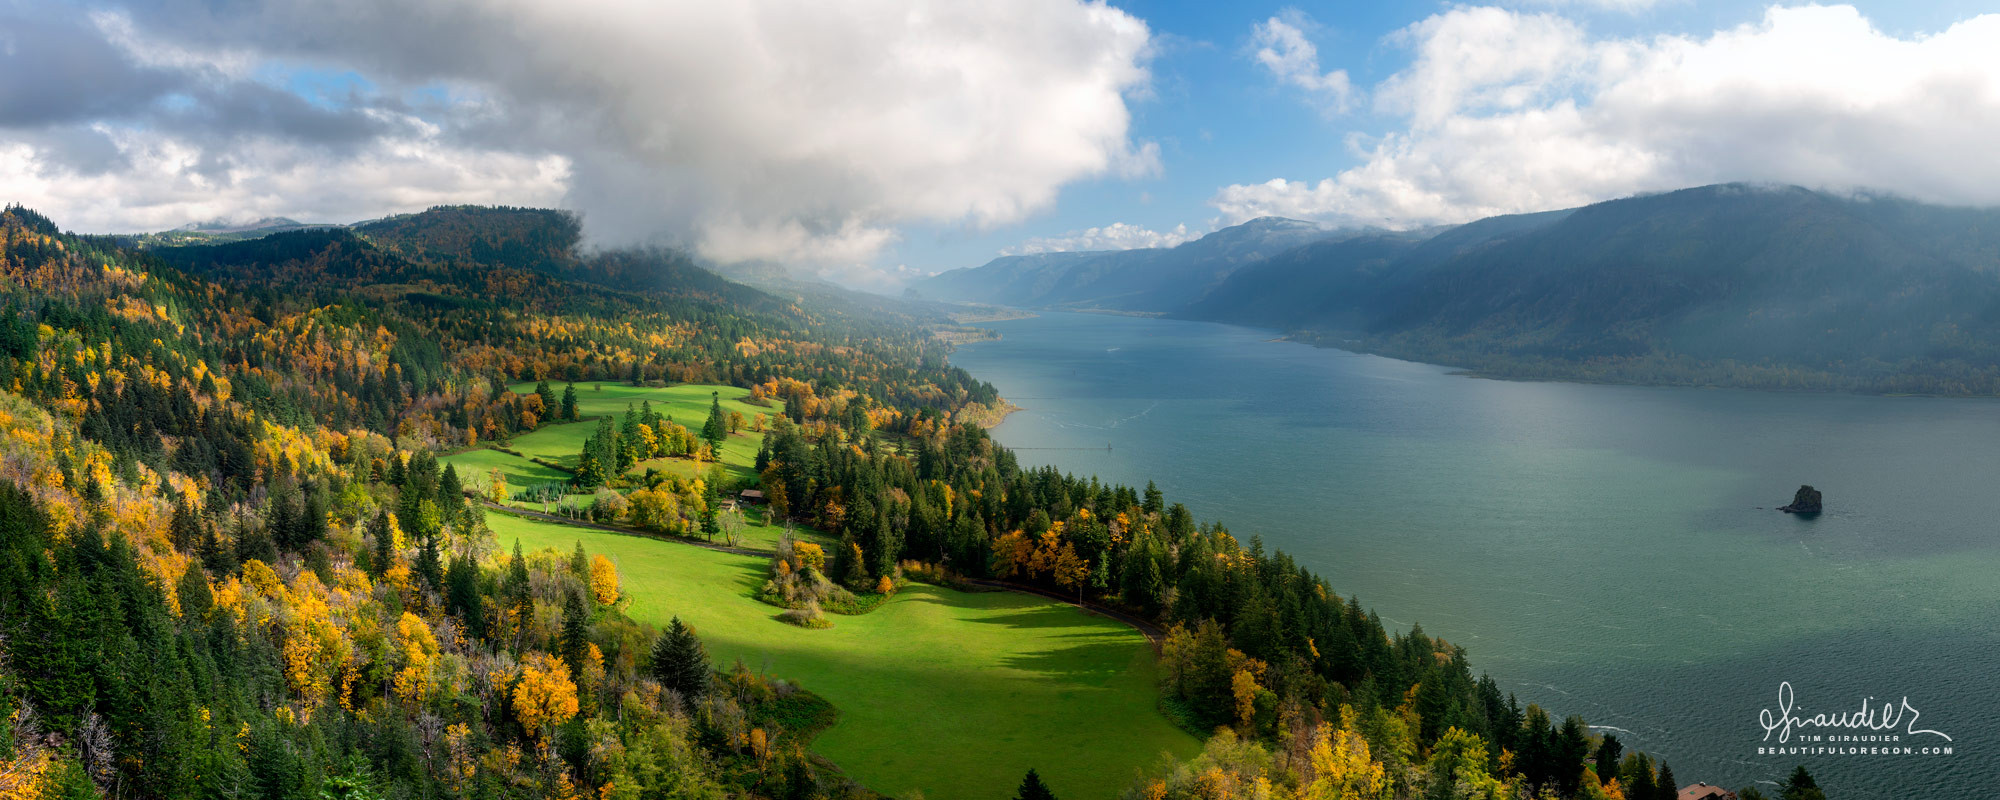 Columbia River Gorge Skamania County Washington State